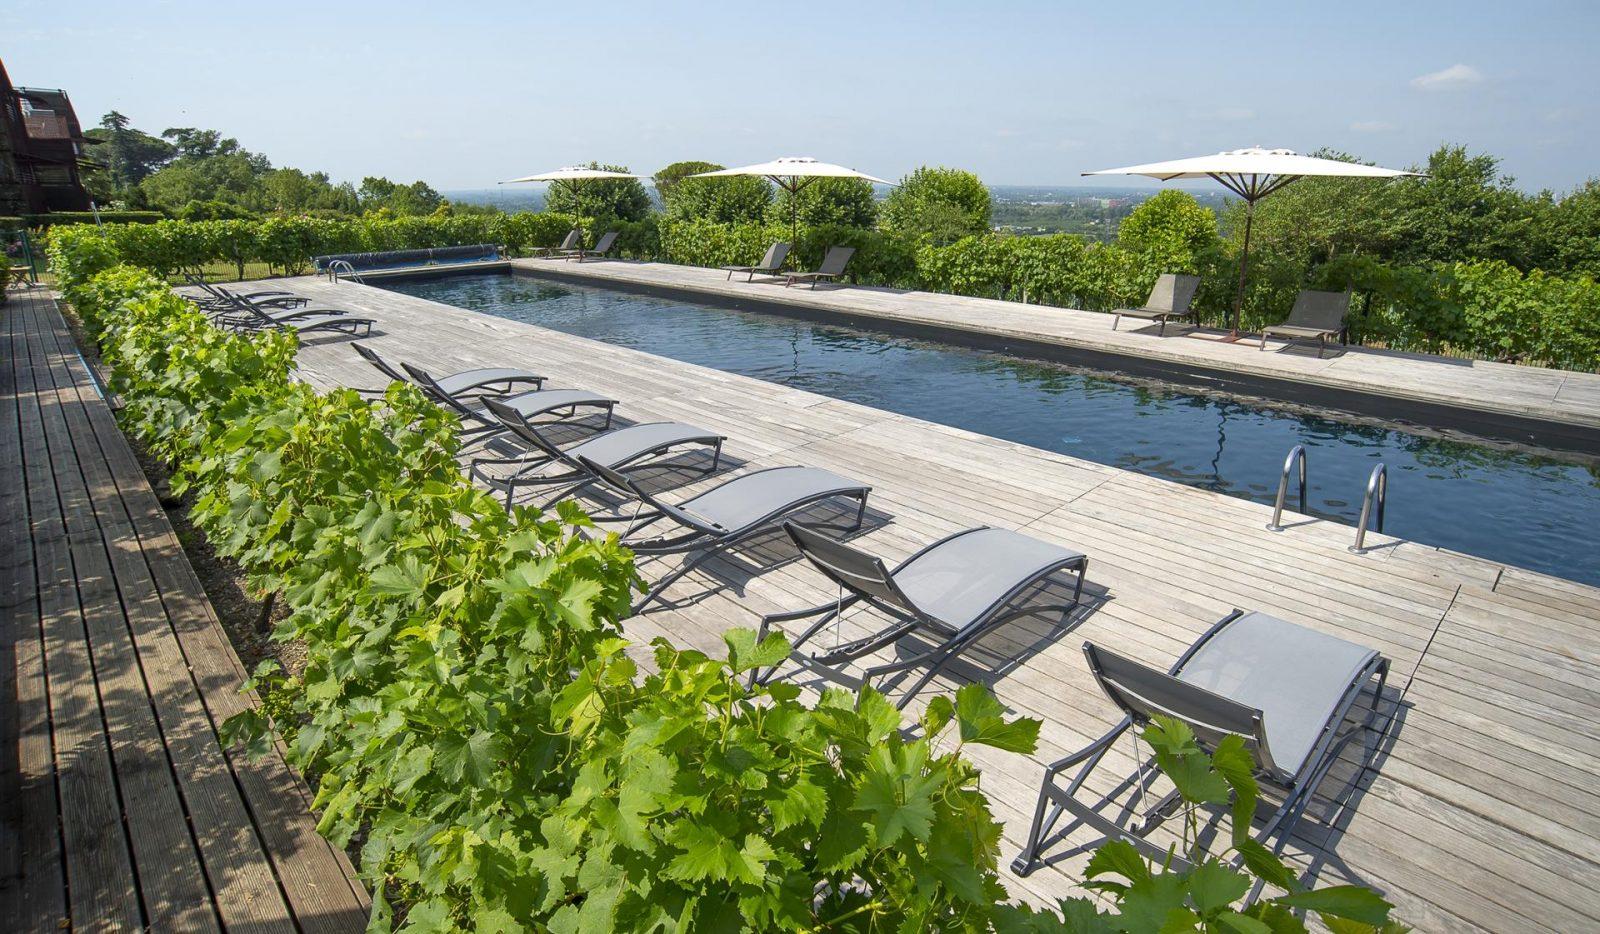 Hotel-STJ-Piscine-10—Droits-Veronique-Vedrenne